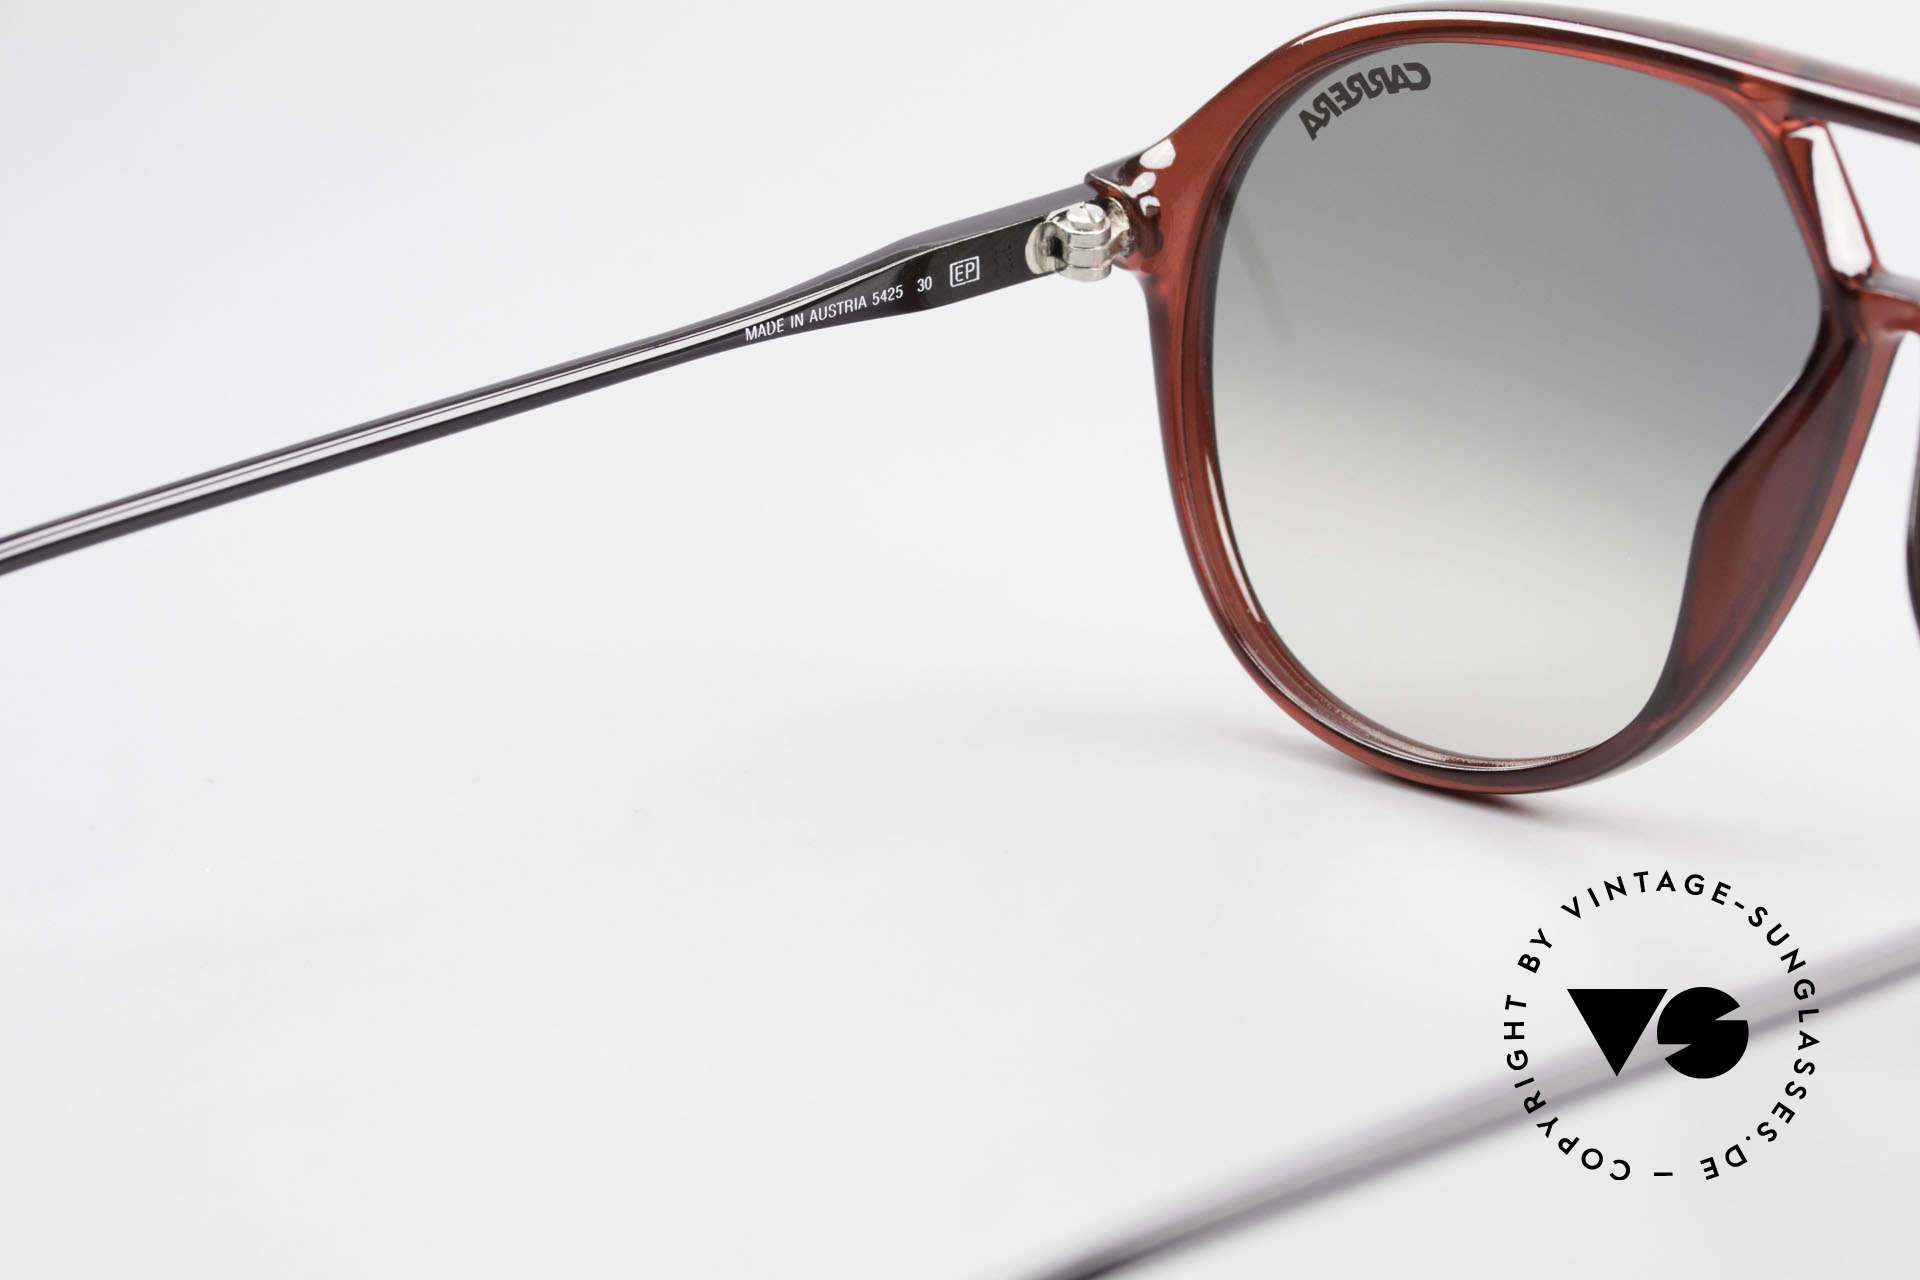 Carrera 5425 Robert De Niro Sunglasses 90's, NO RETRO sunglasses, but an authentic old ORIGINAL!, Made for Men